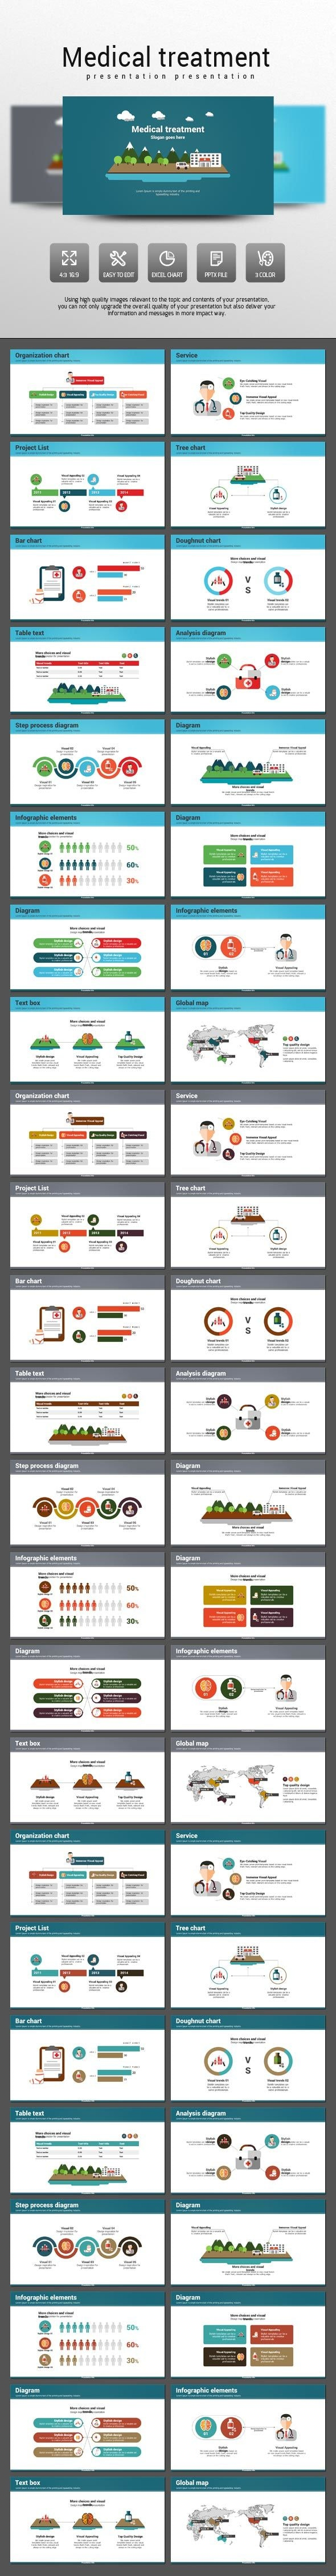 Medical Treatment - PowerPoint Templates Presentation Templates